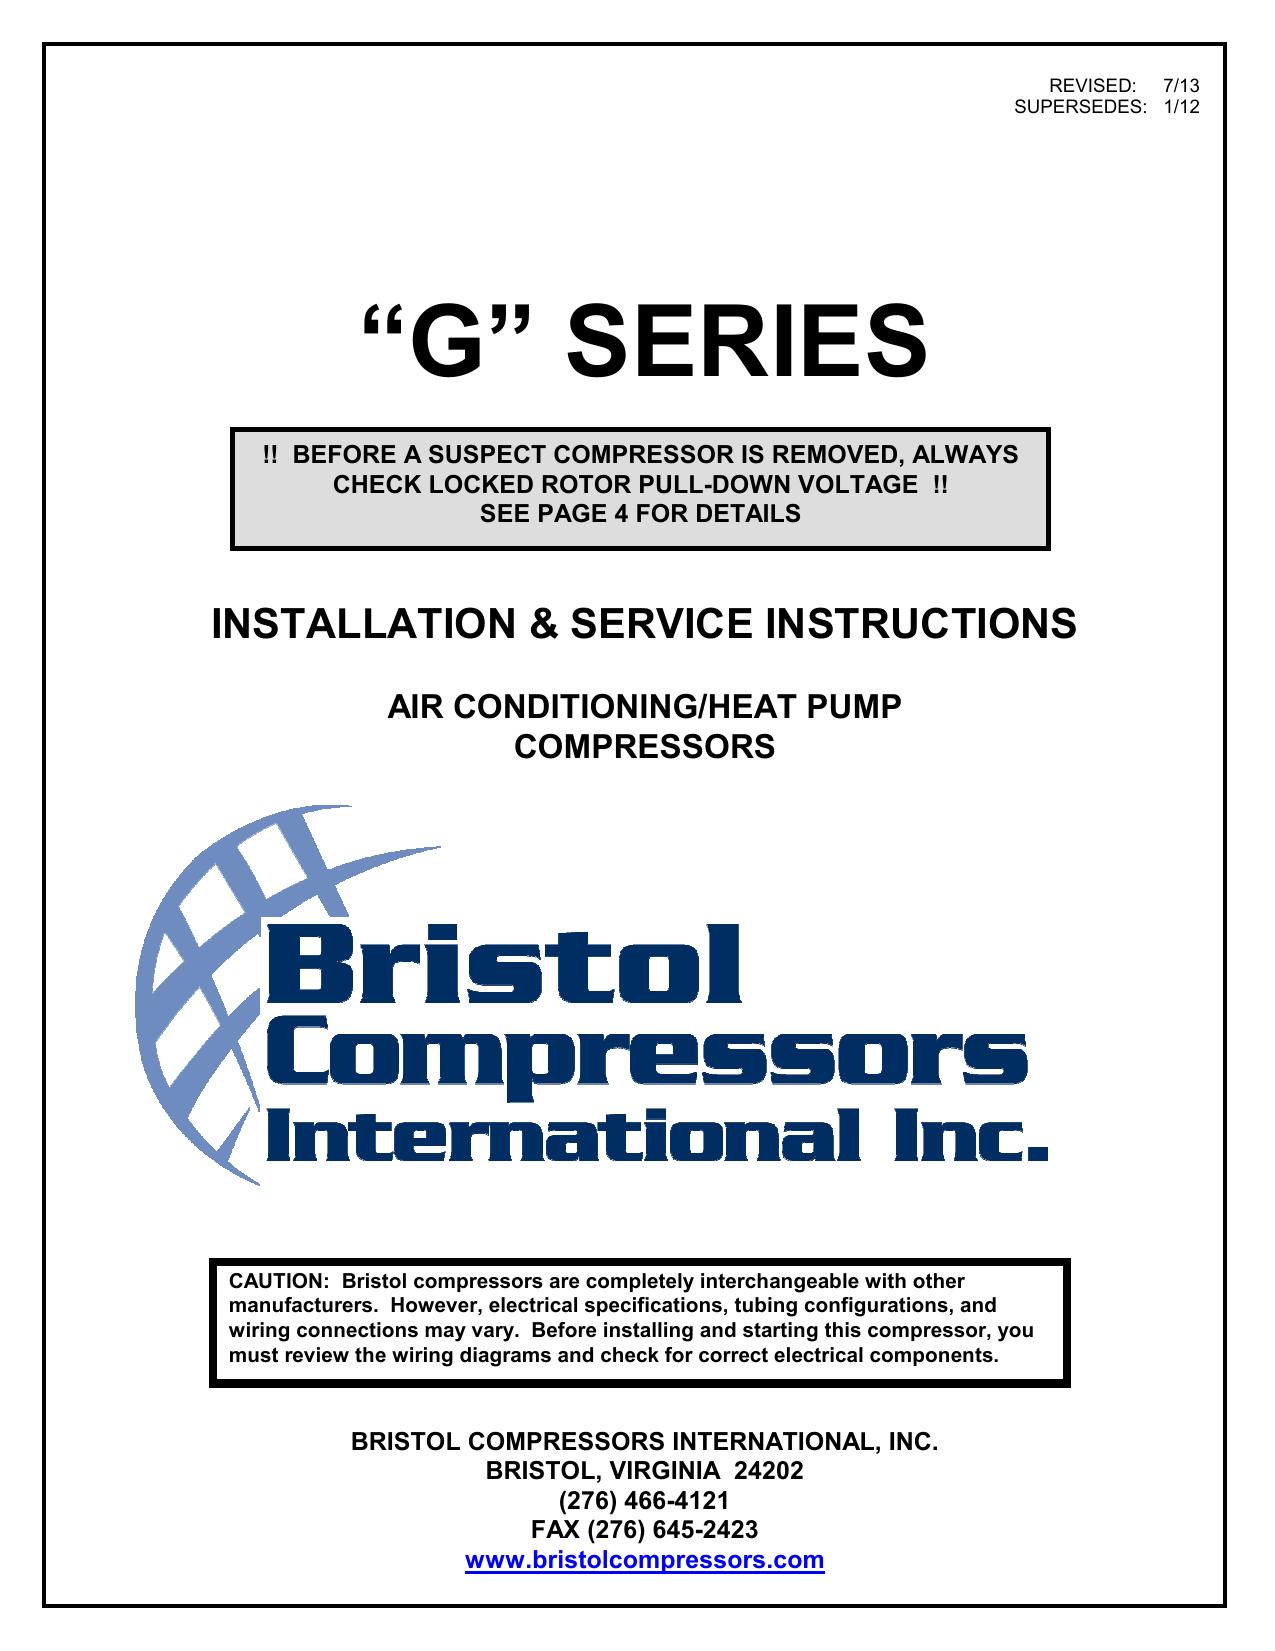 G Series Bristol Compressors Manualzz